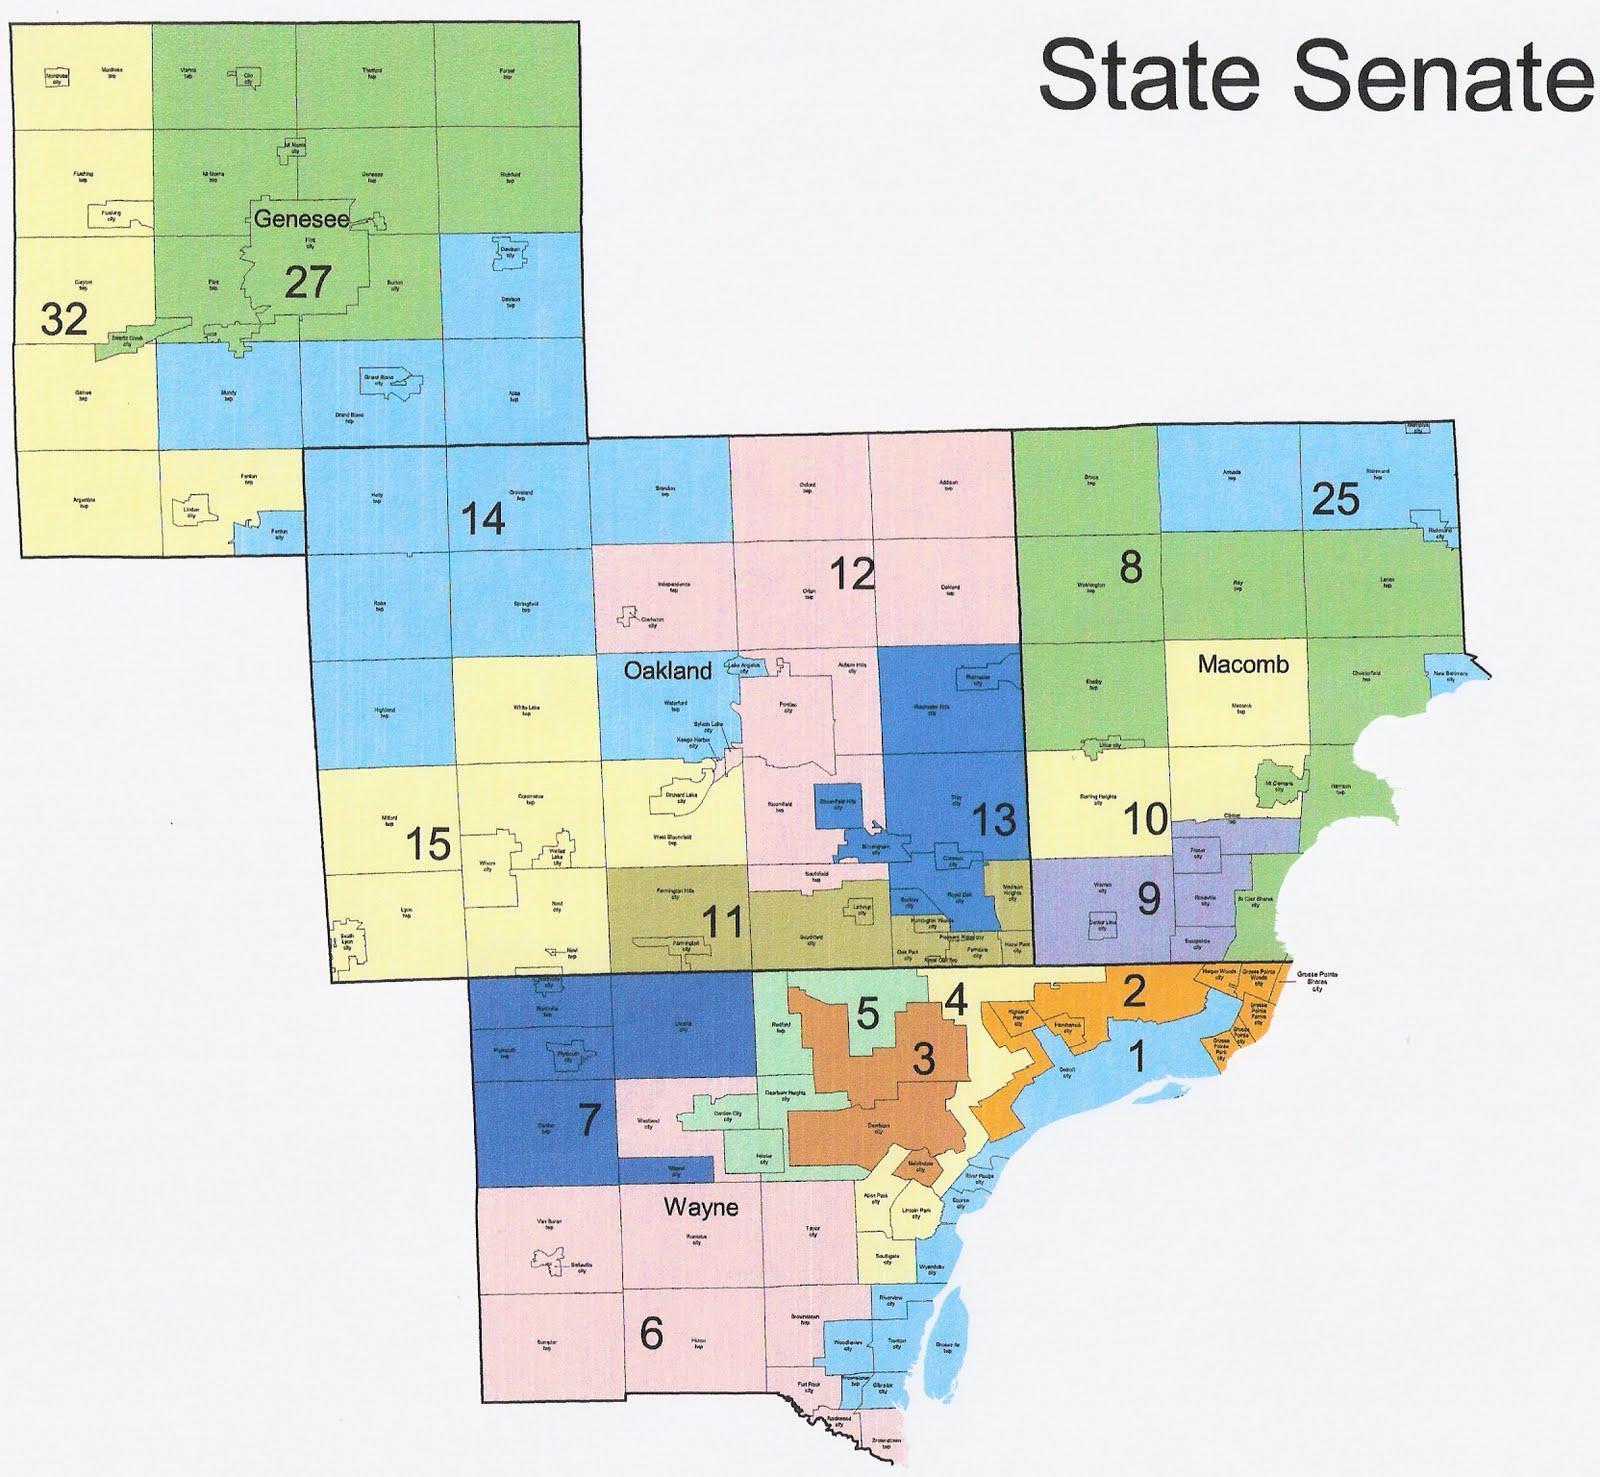 Michigan Redistricting: Republican State Senate Map Passed